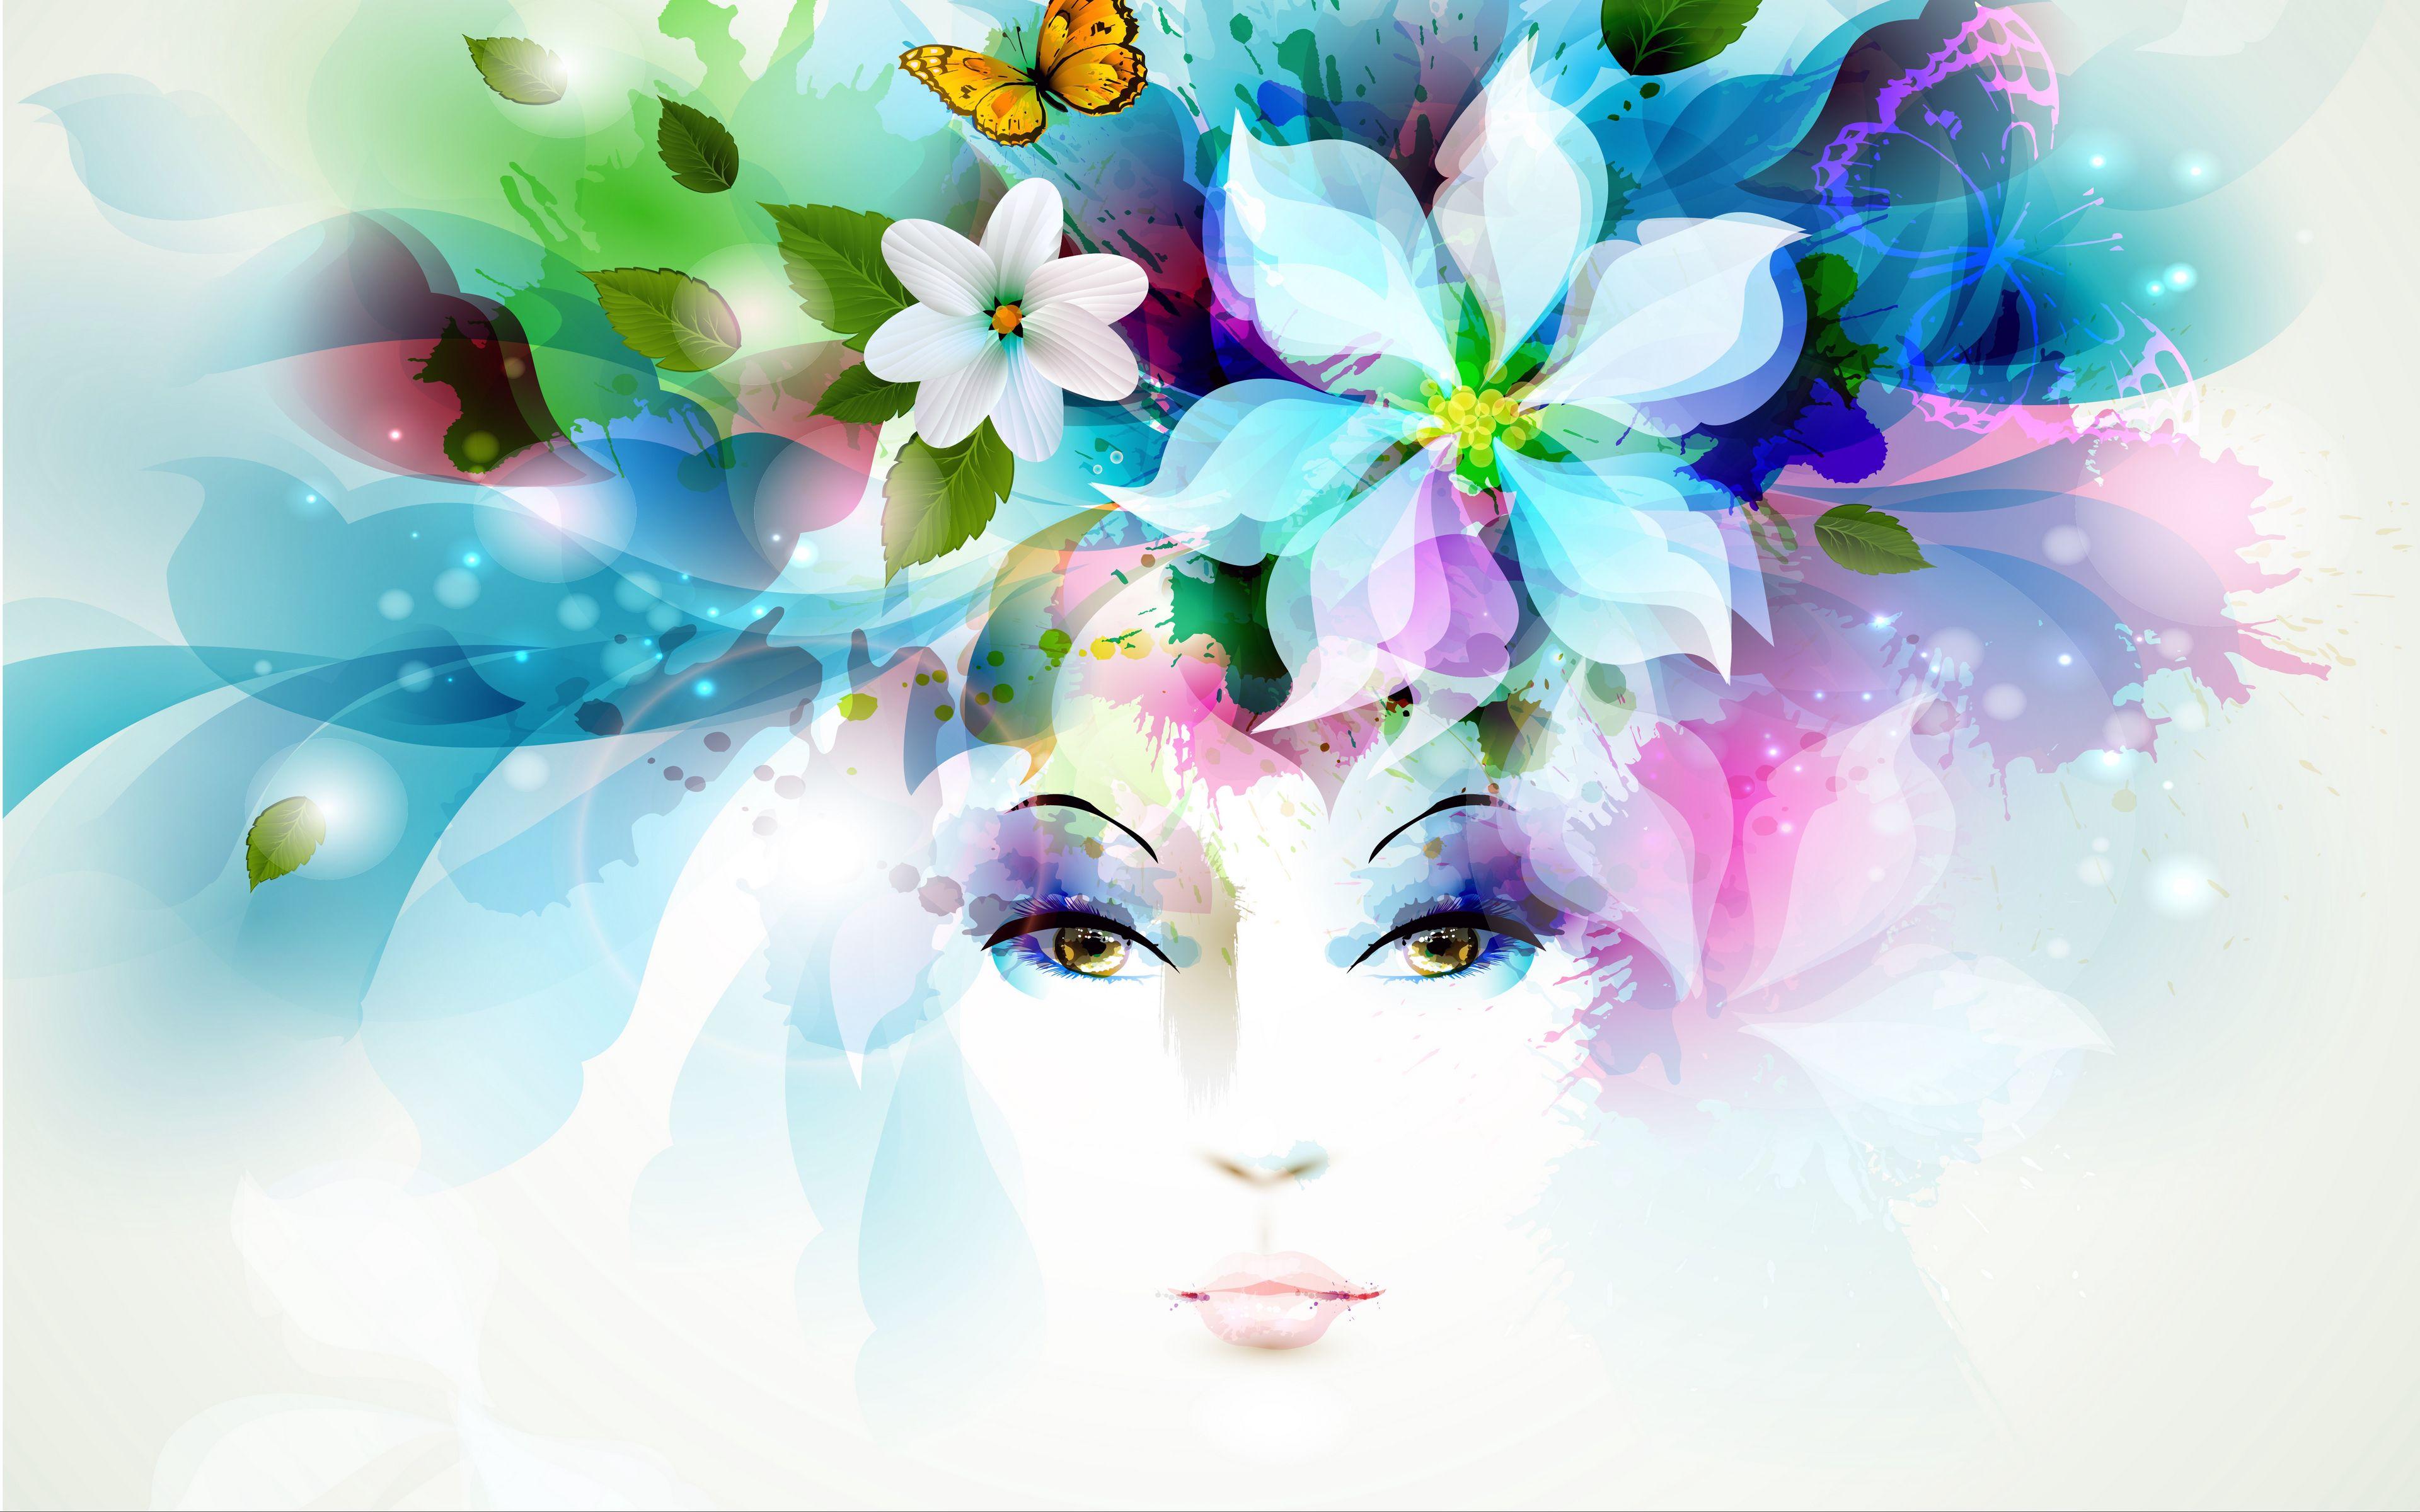 3840x2400 Wallpaper art, girl, eyes, flowers, petals, butterfly, leaves, spray